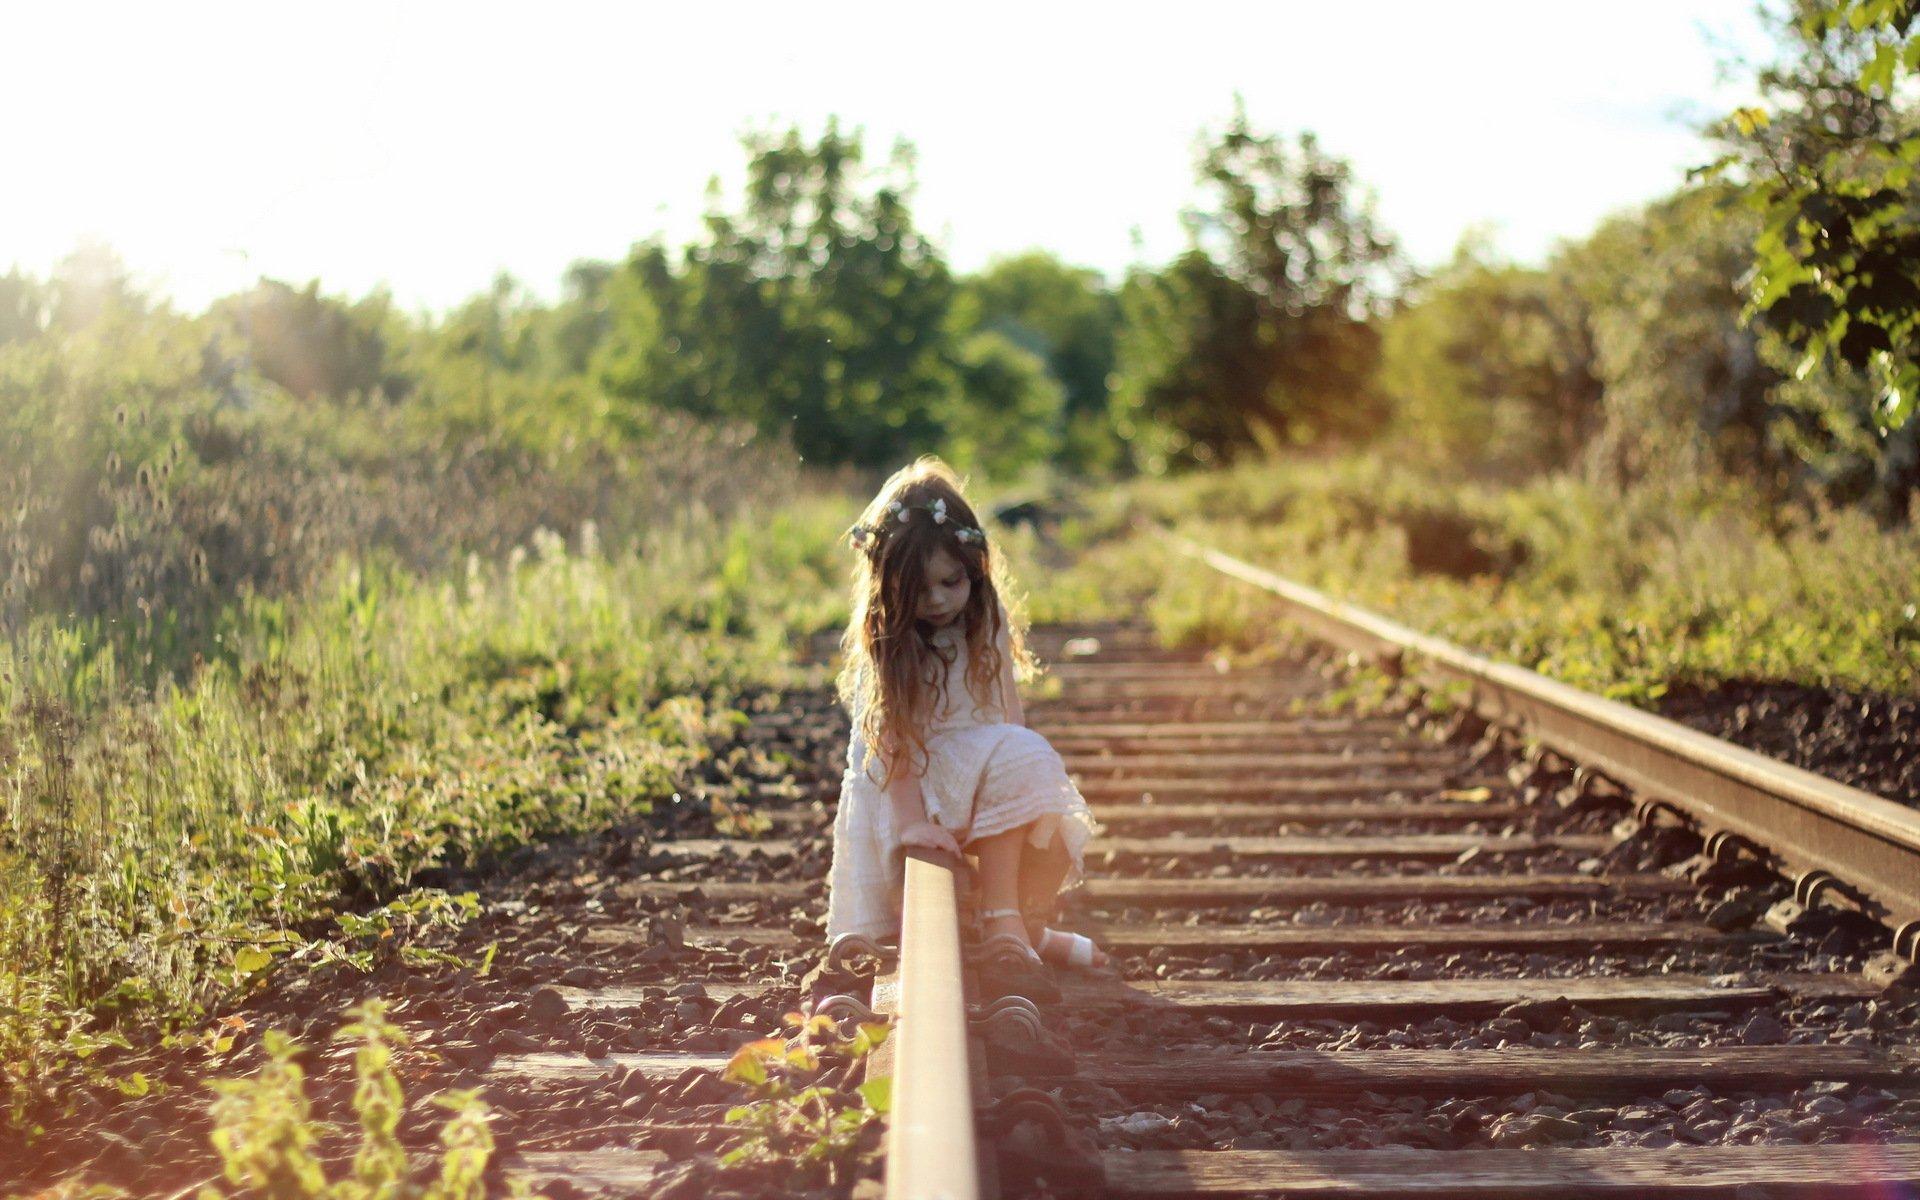 Девочка надороге без смс